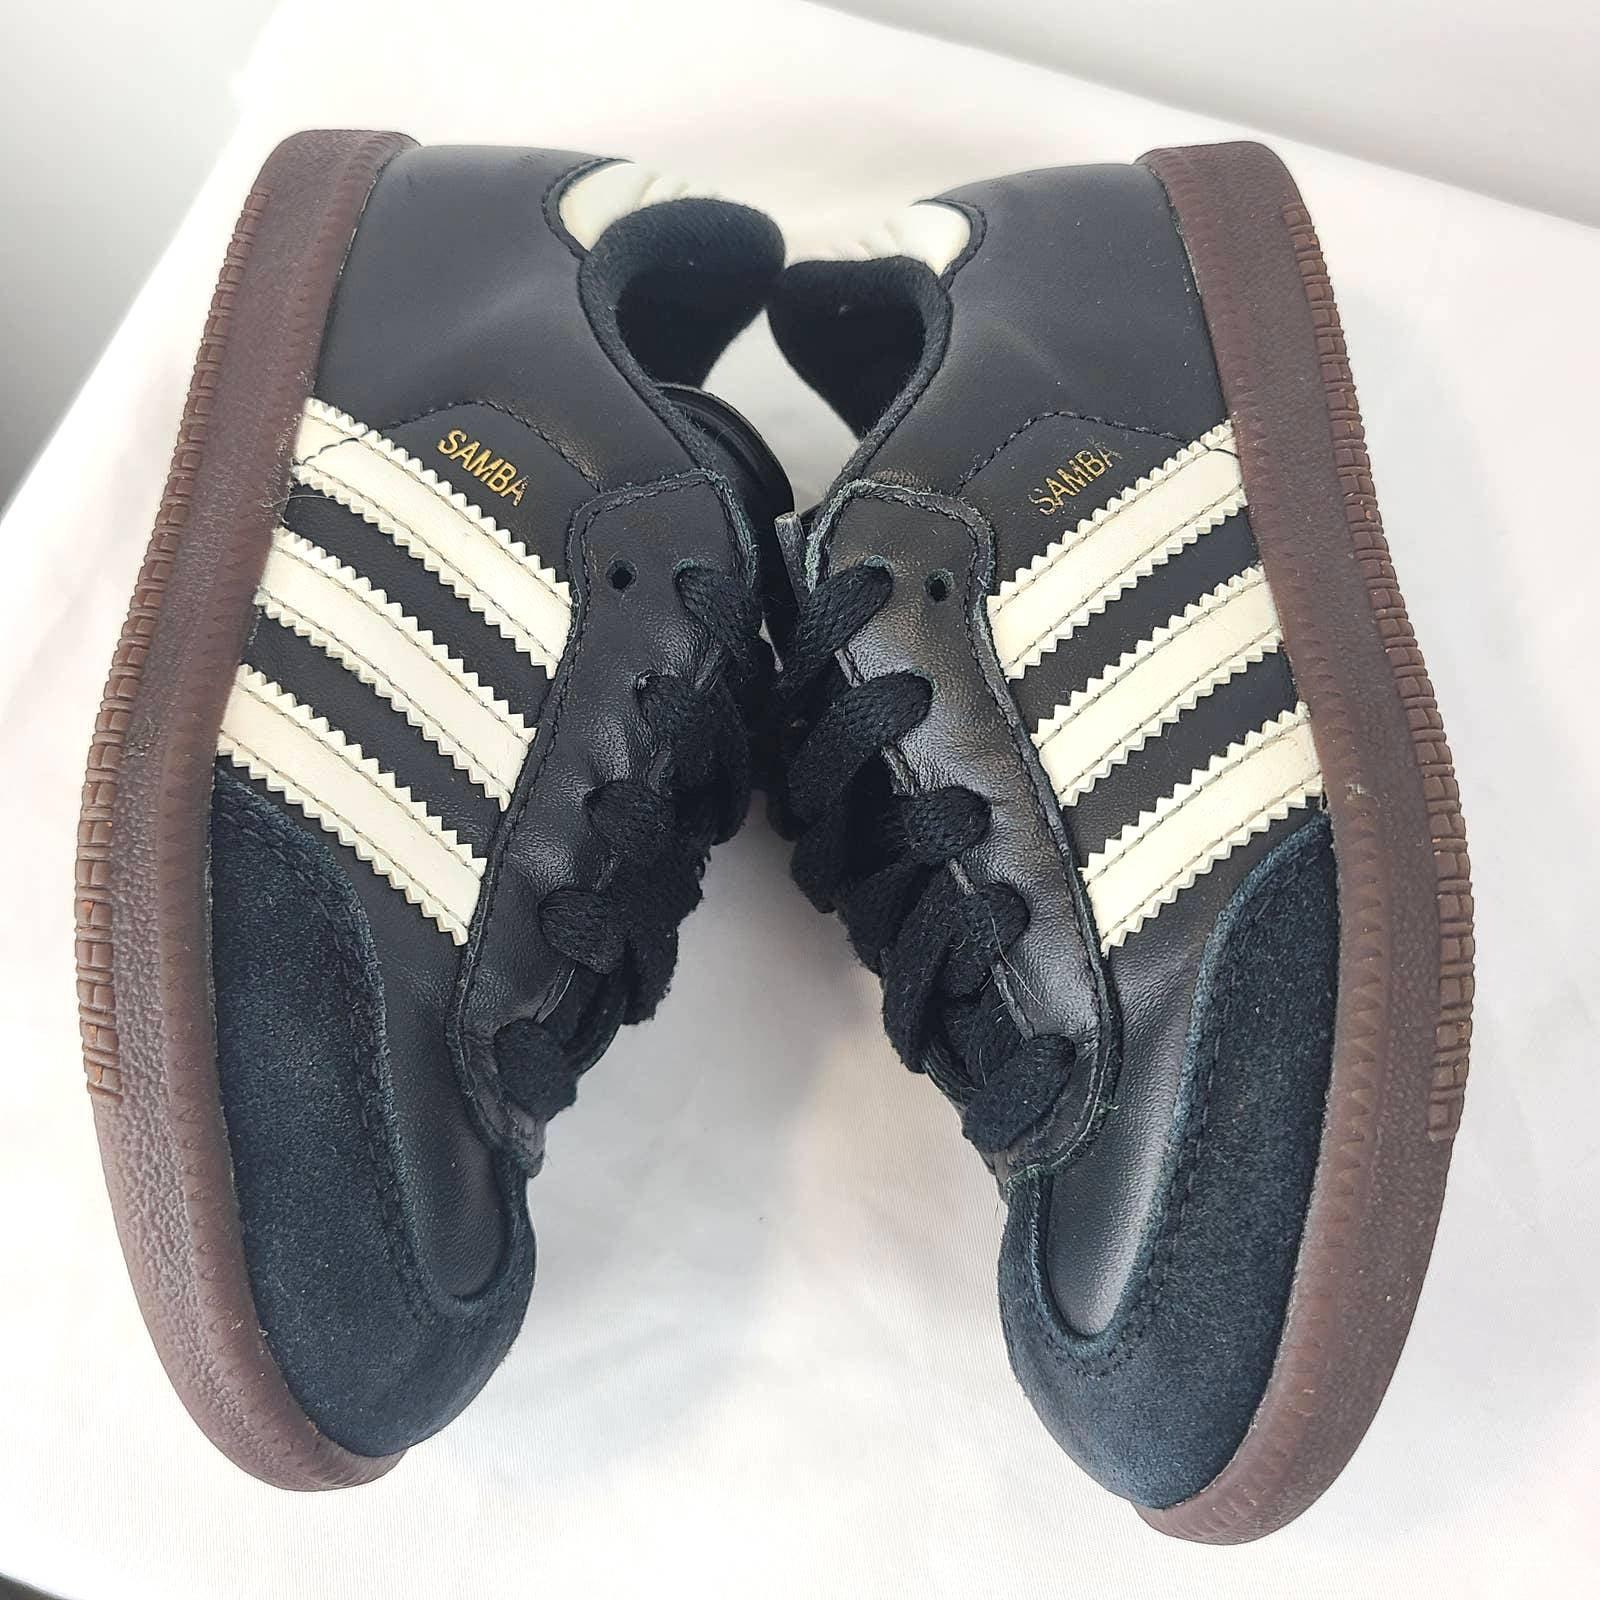 Adidas Kids' Samba Classic Soccer Shoe